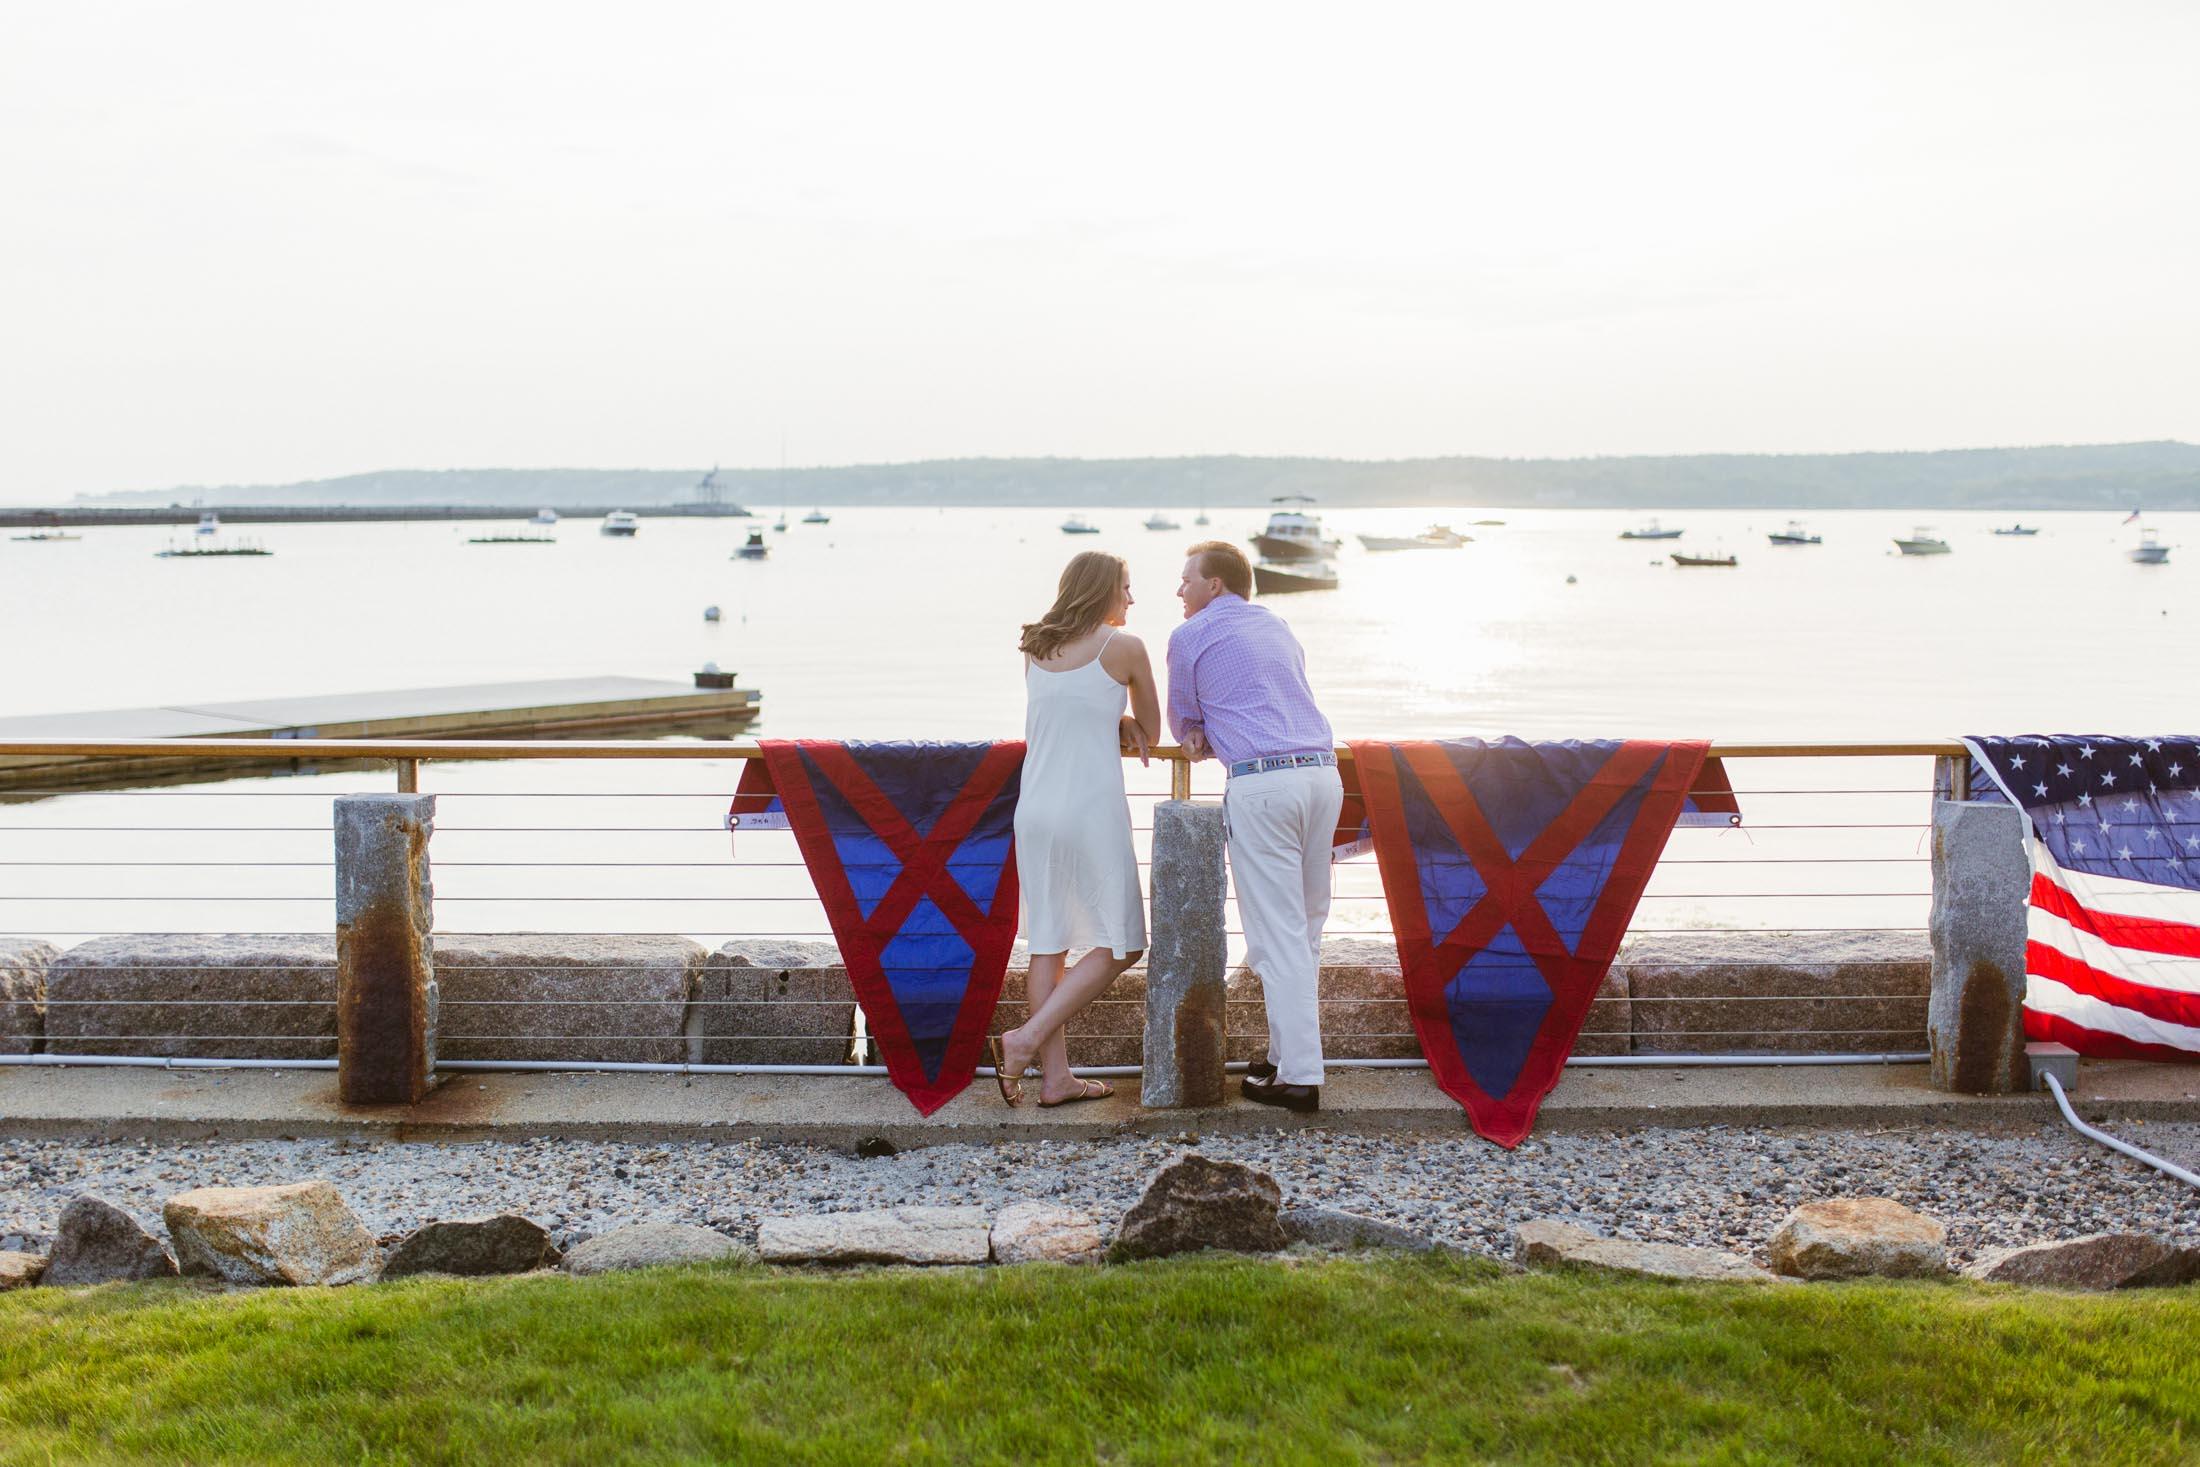 Eastern-Point-yacht-Club-Engagement-5.jpg